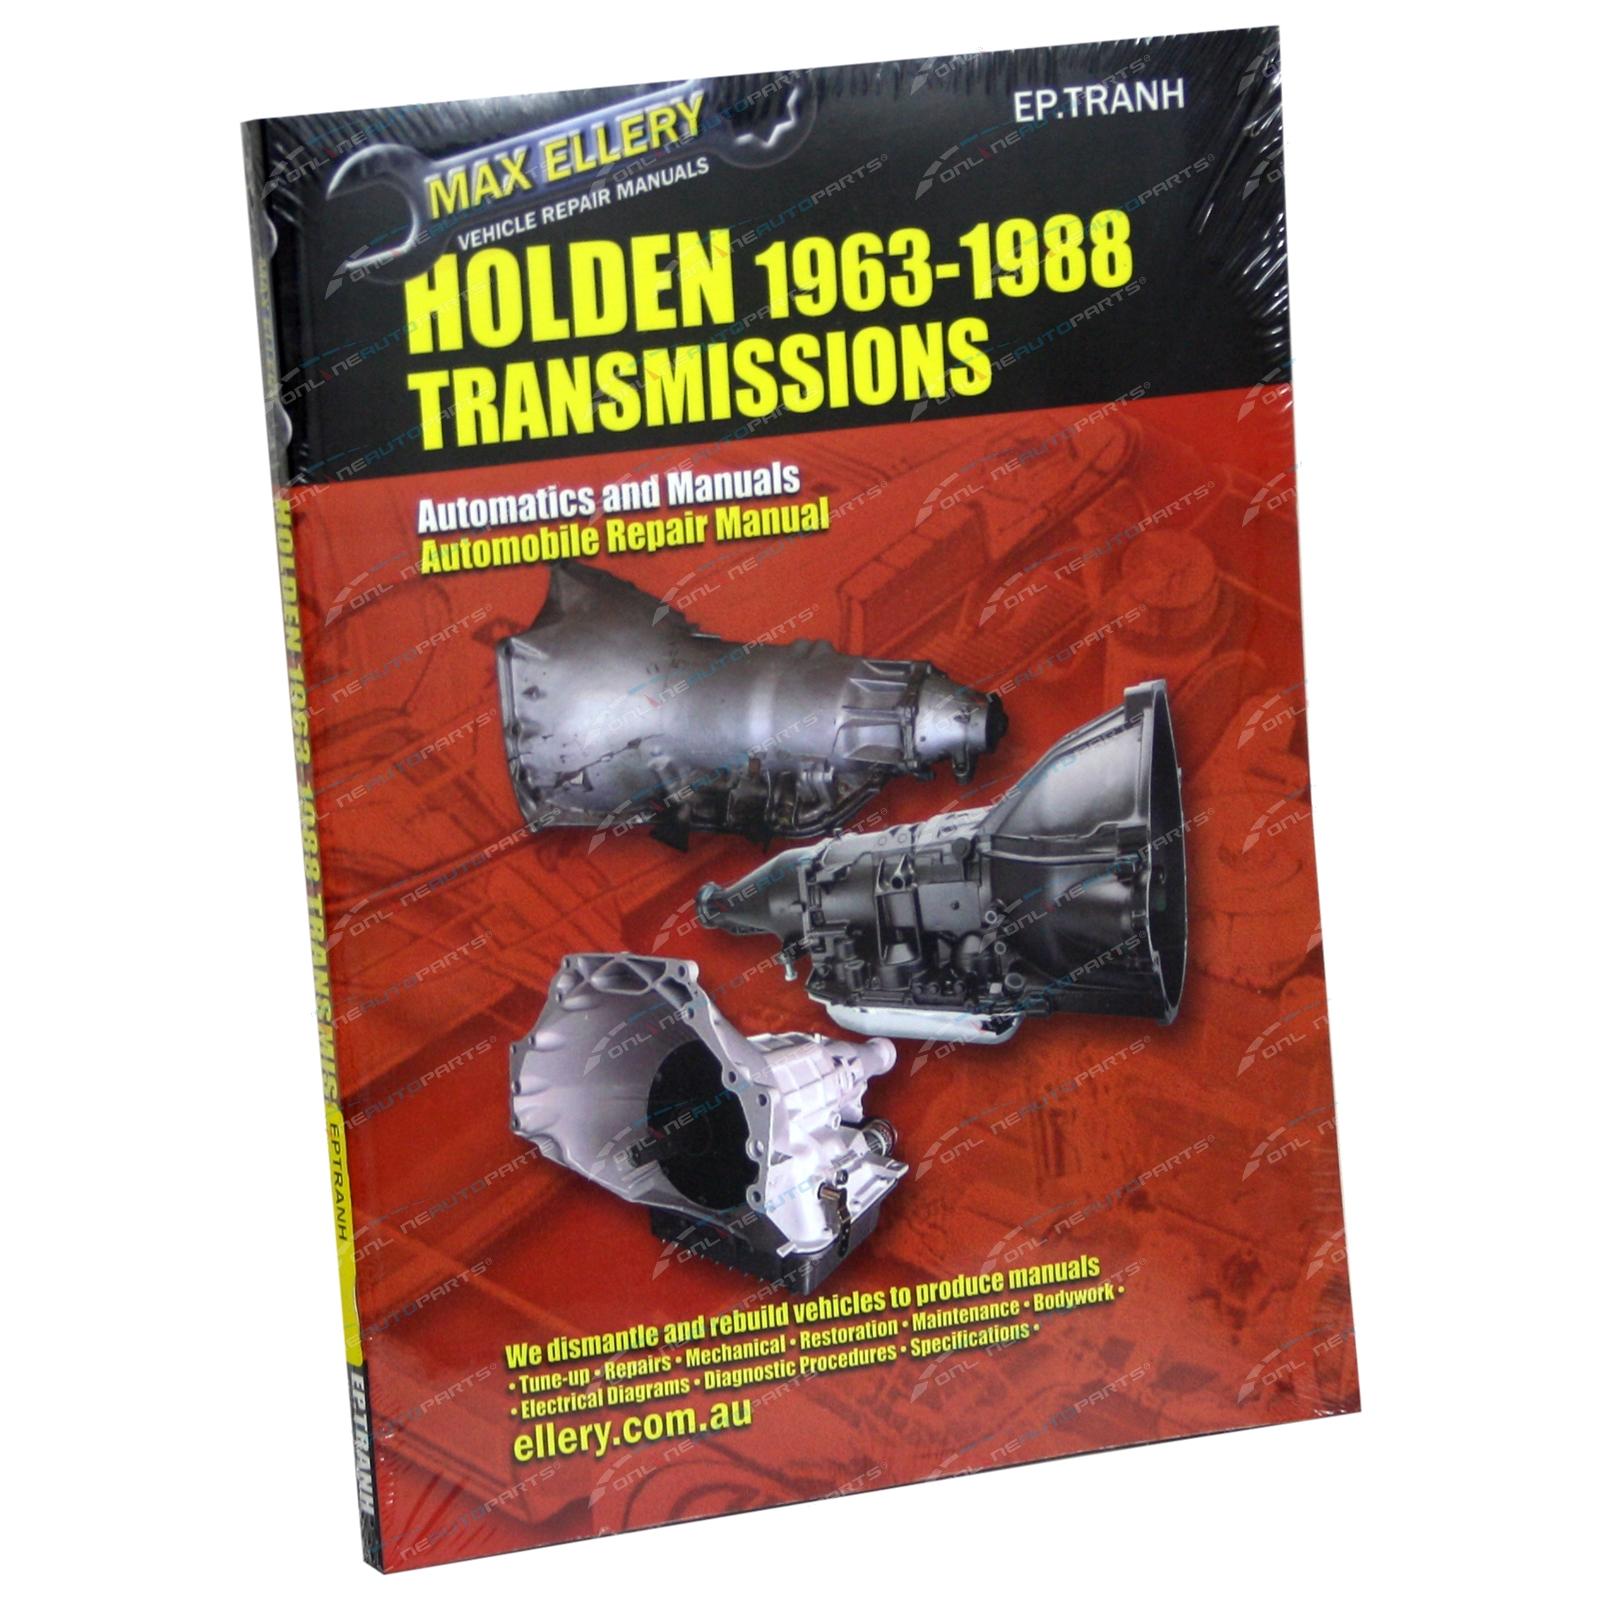 max ellerys vehicle repair manuals